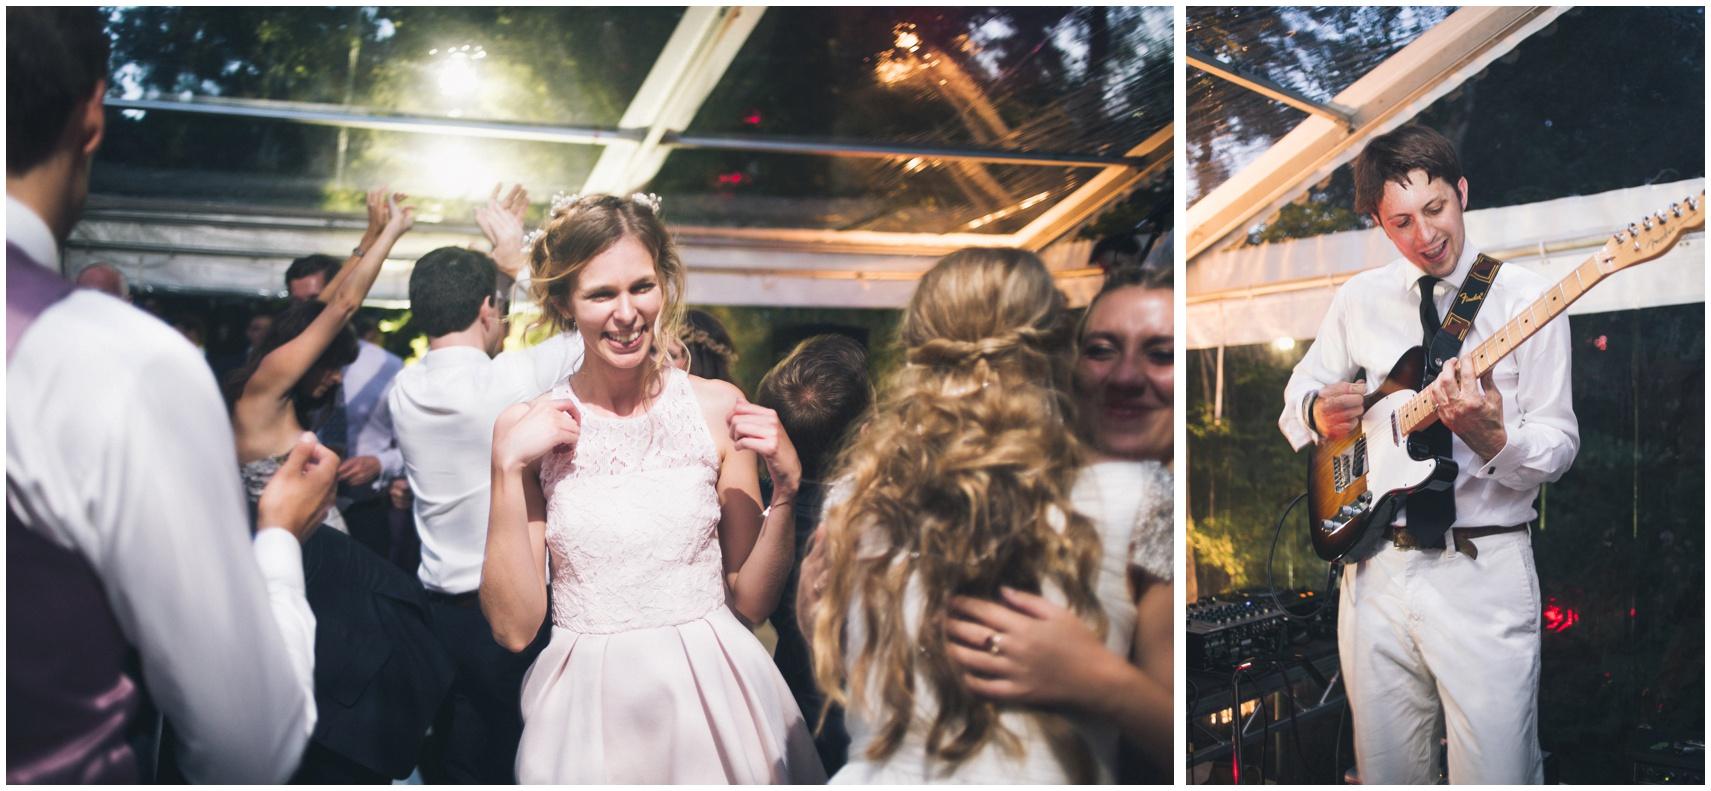 BMC Wedding photography Rutland_0360.jpg